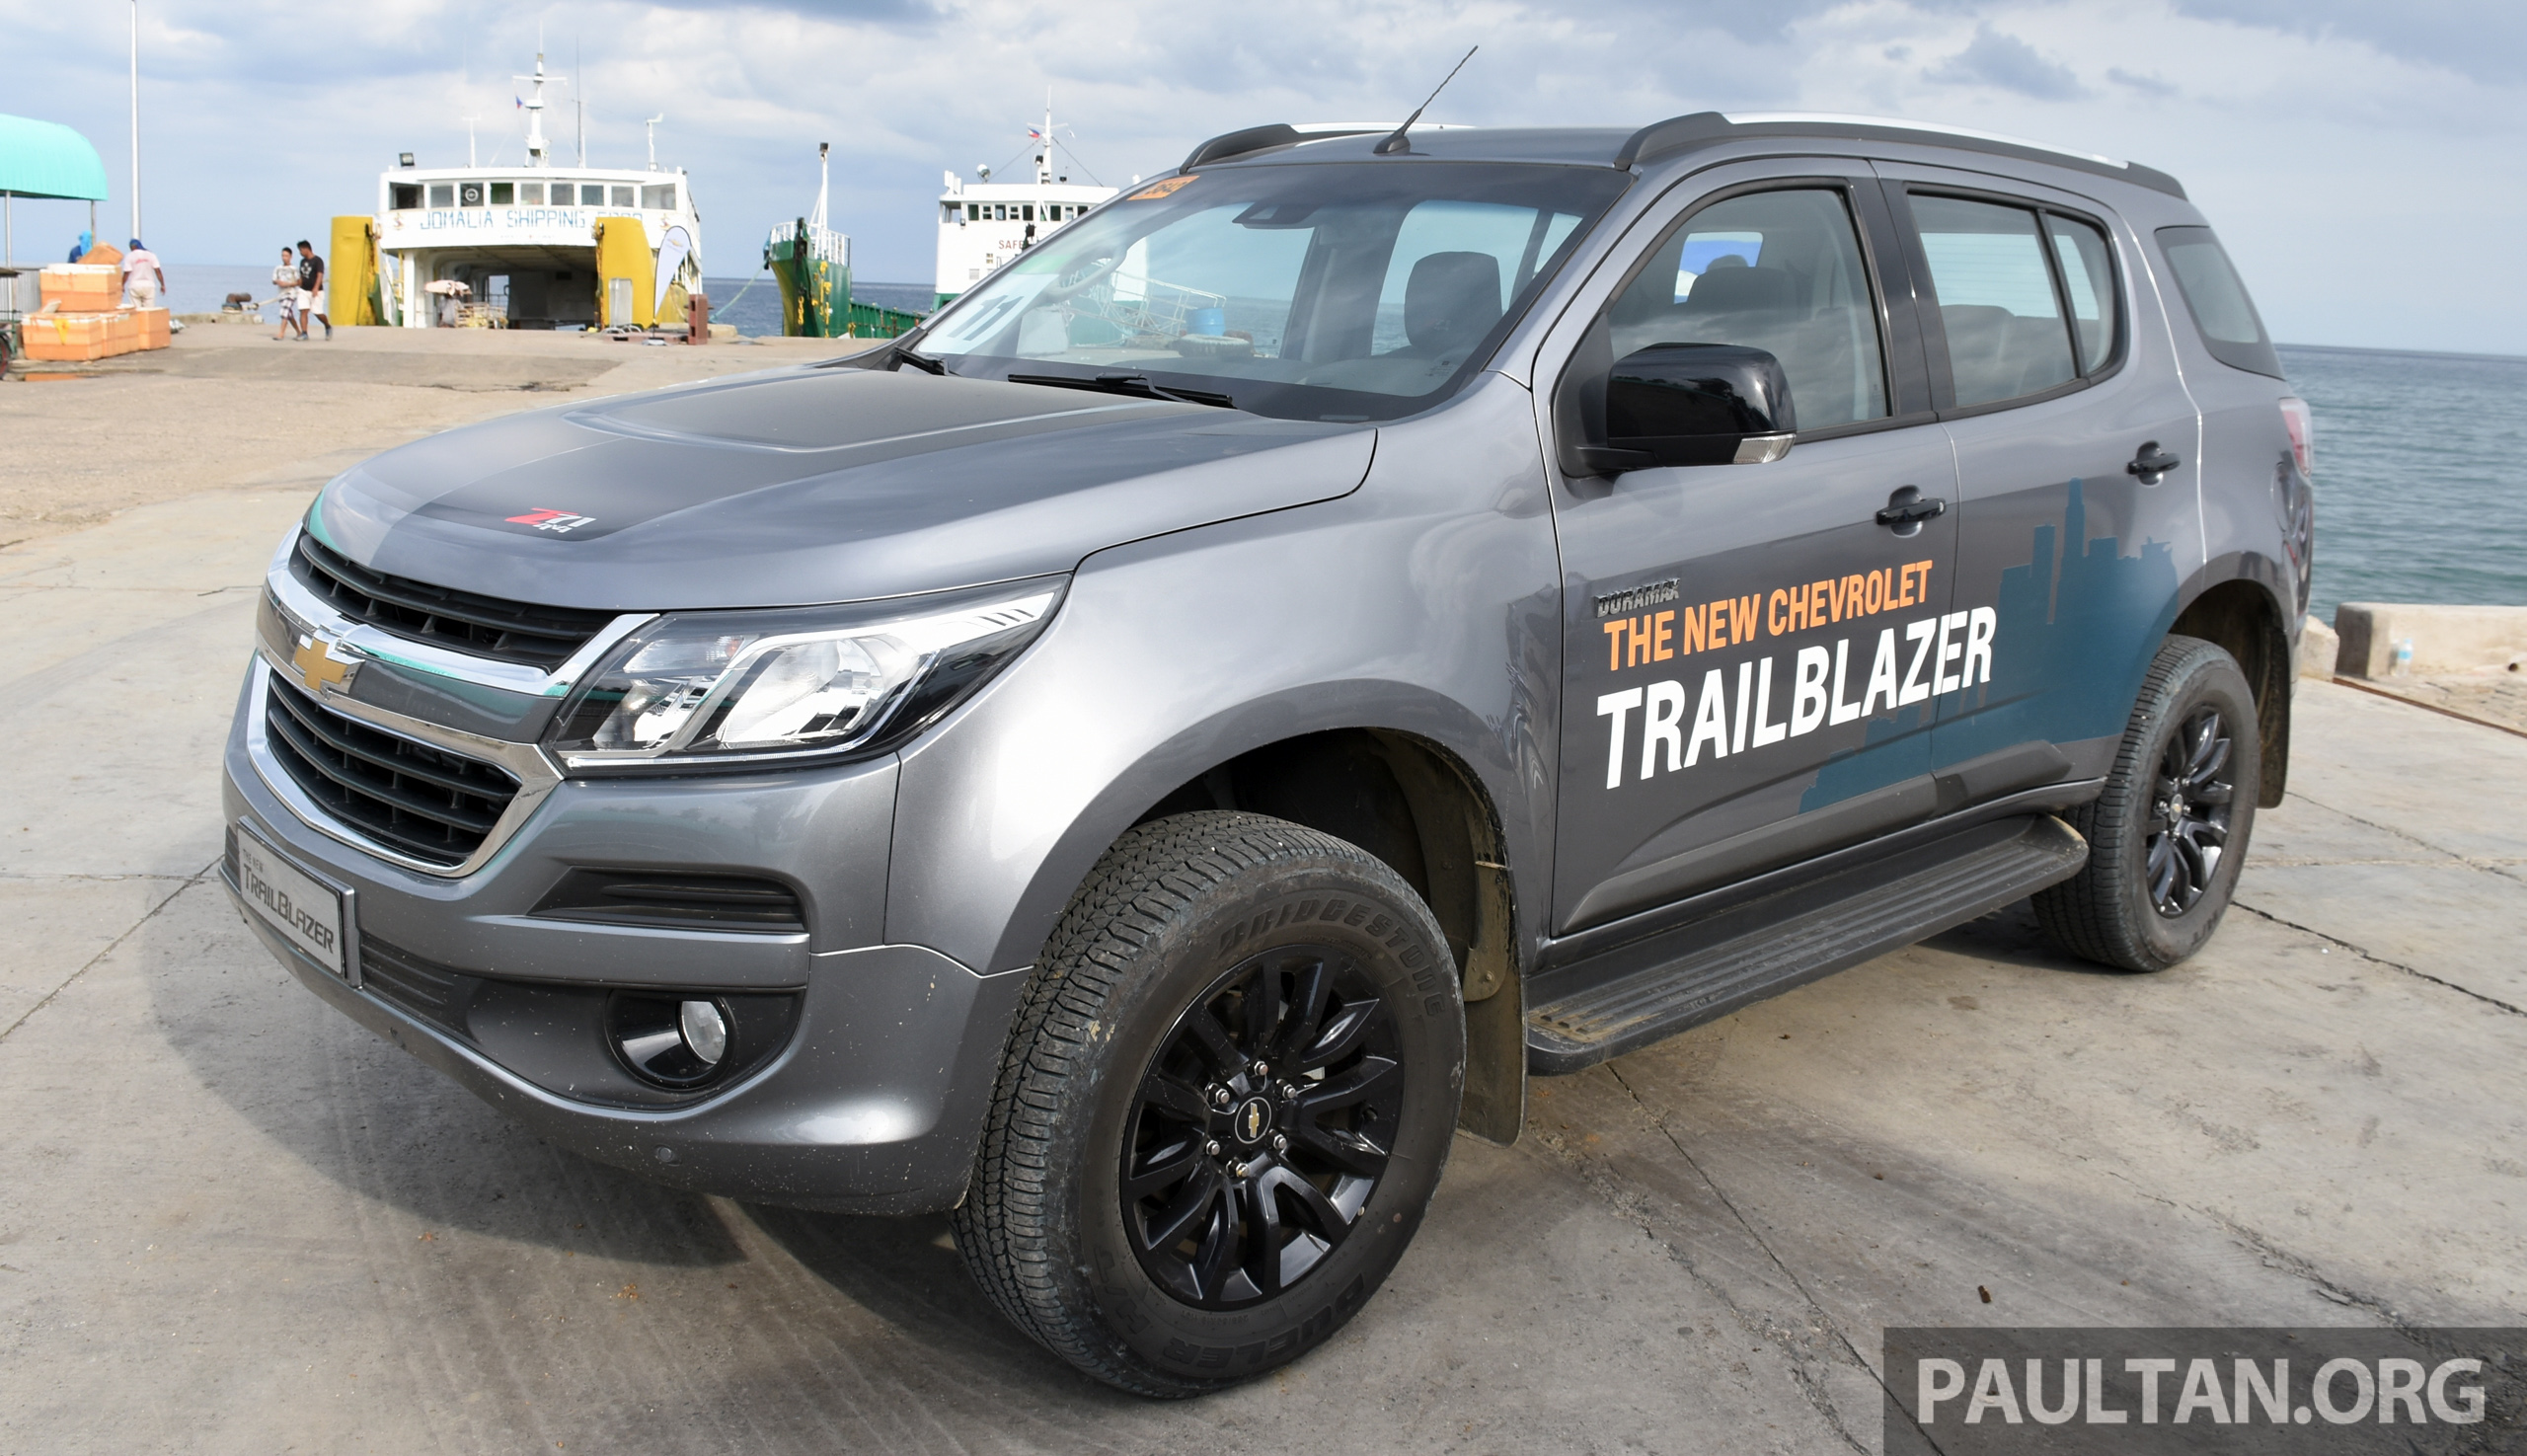 2016 Chevy Trailblazer >> Paul Tan Image 550912